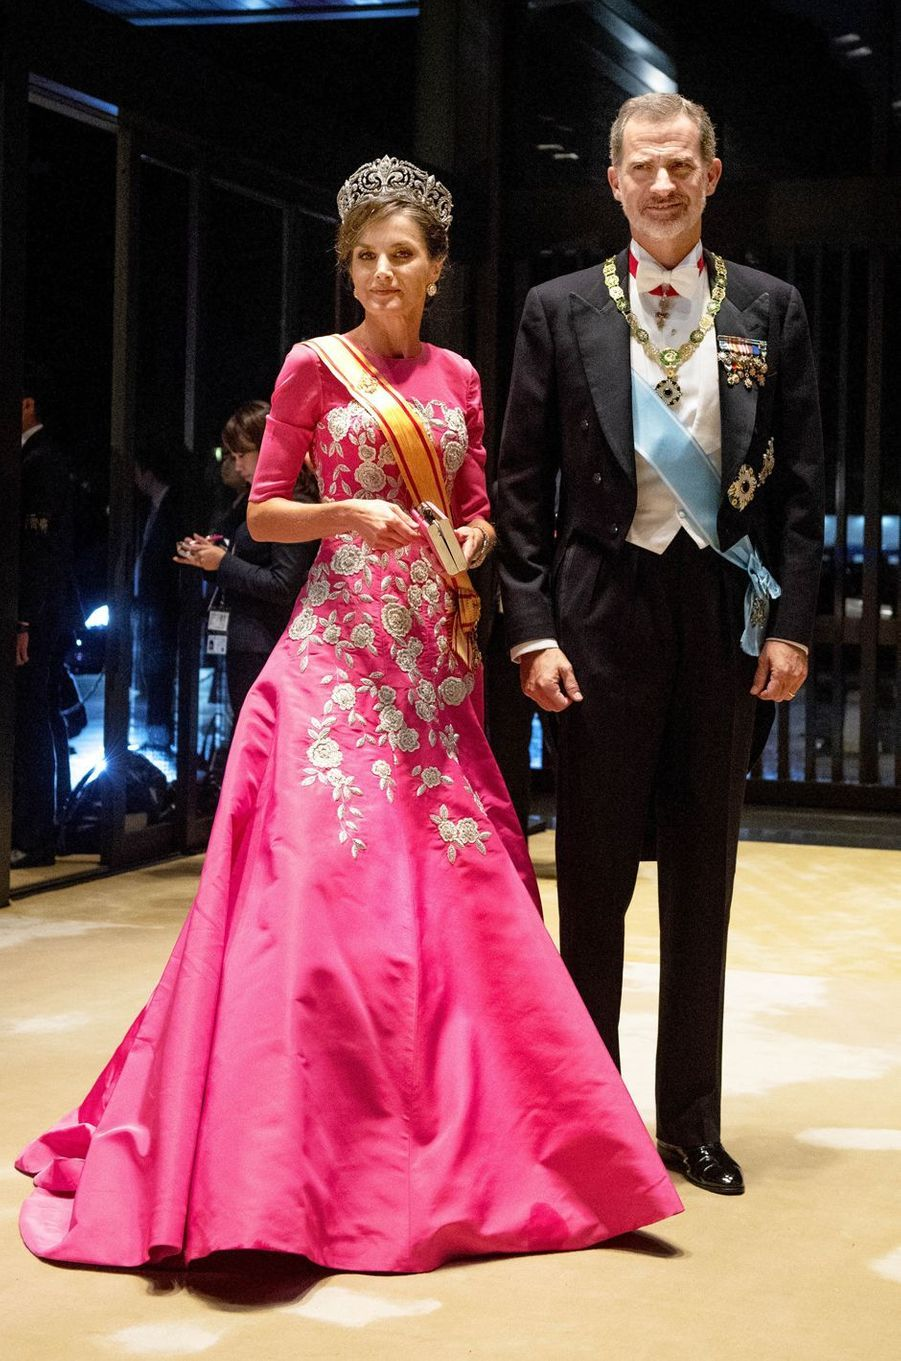 La reine Letizia d'Espagne dans une robe Carolina Herrera à Tokyo, le 22 octobre 2019